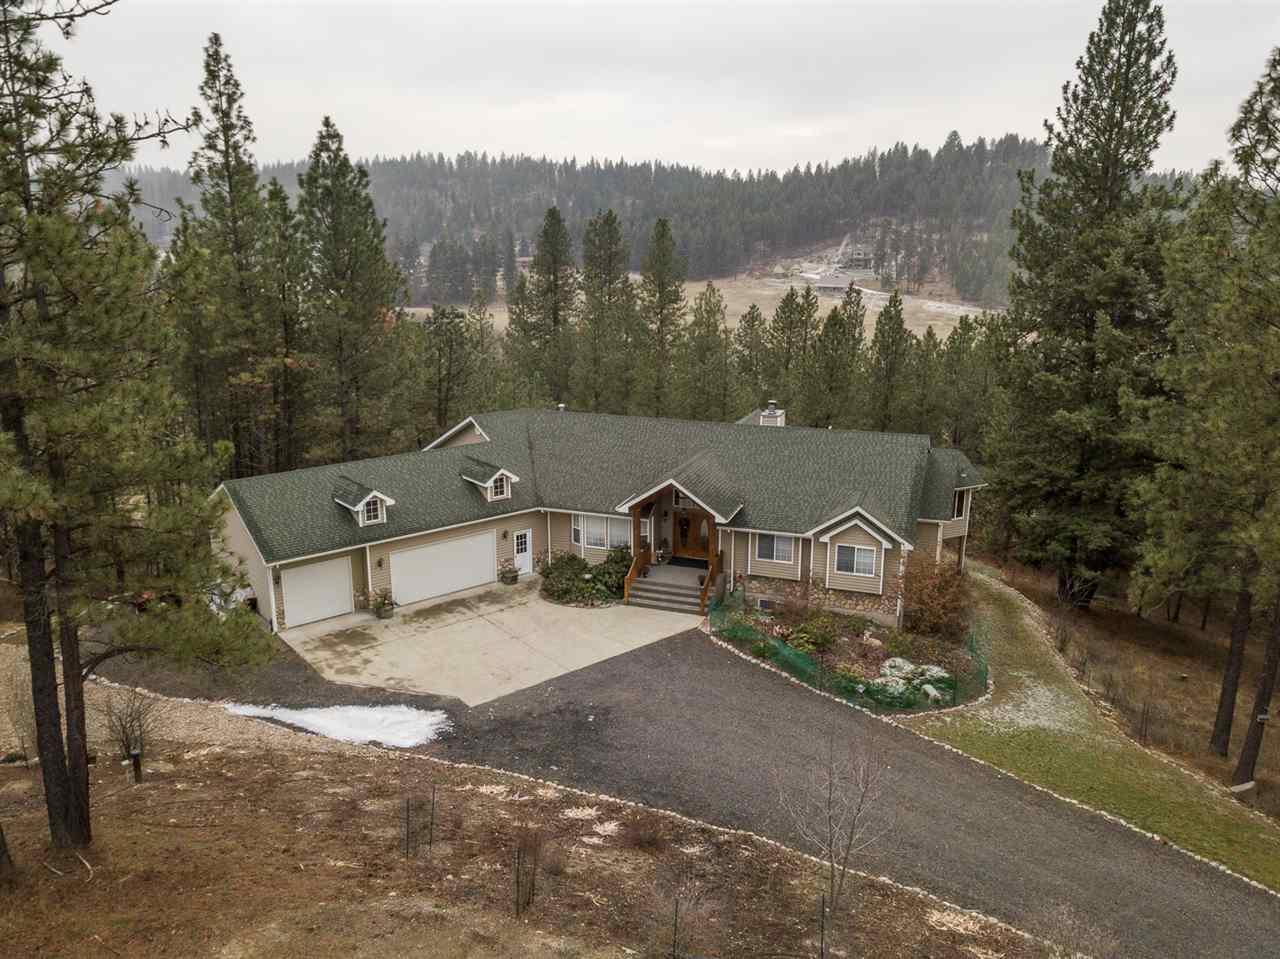 Single Family Home for Sale at 12409 E Big Meadows Road 12409 E Big Meadows Road Chattaroy, Washington 99003 United States